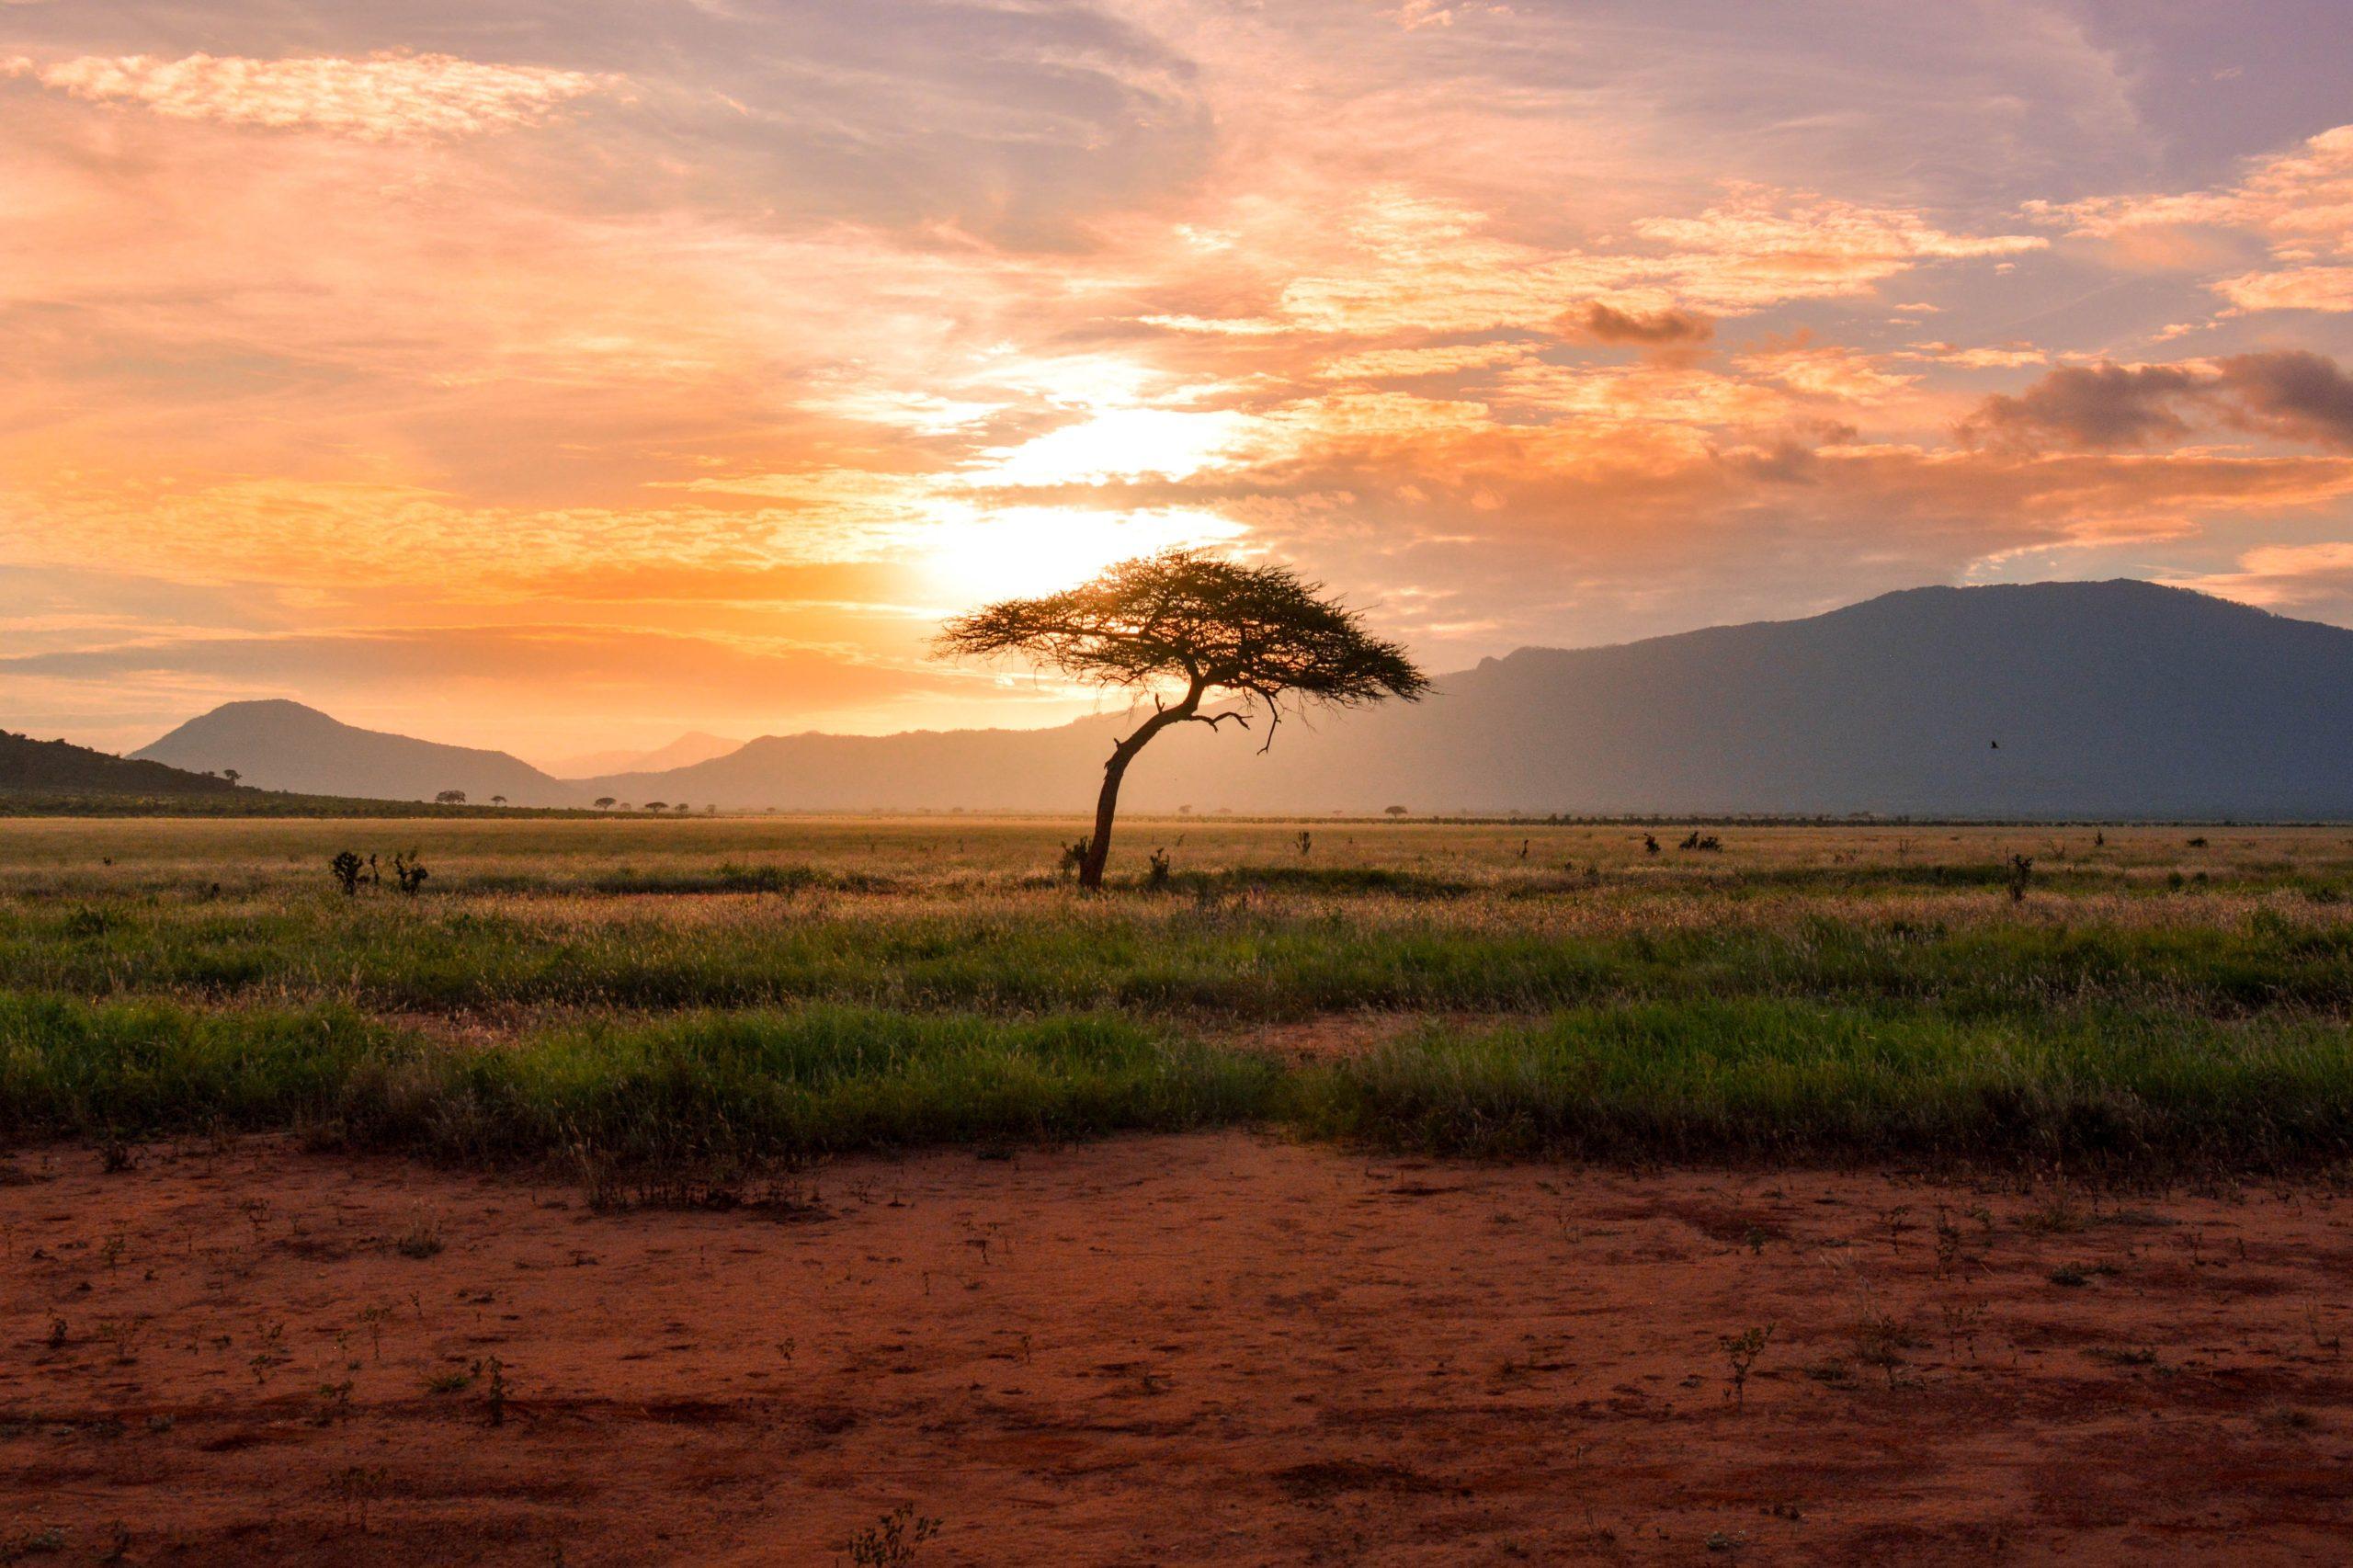 Sunset at Samburu National Reserve on safari extension for MedTreks Kenya